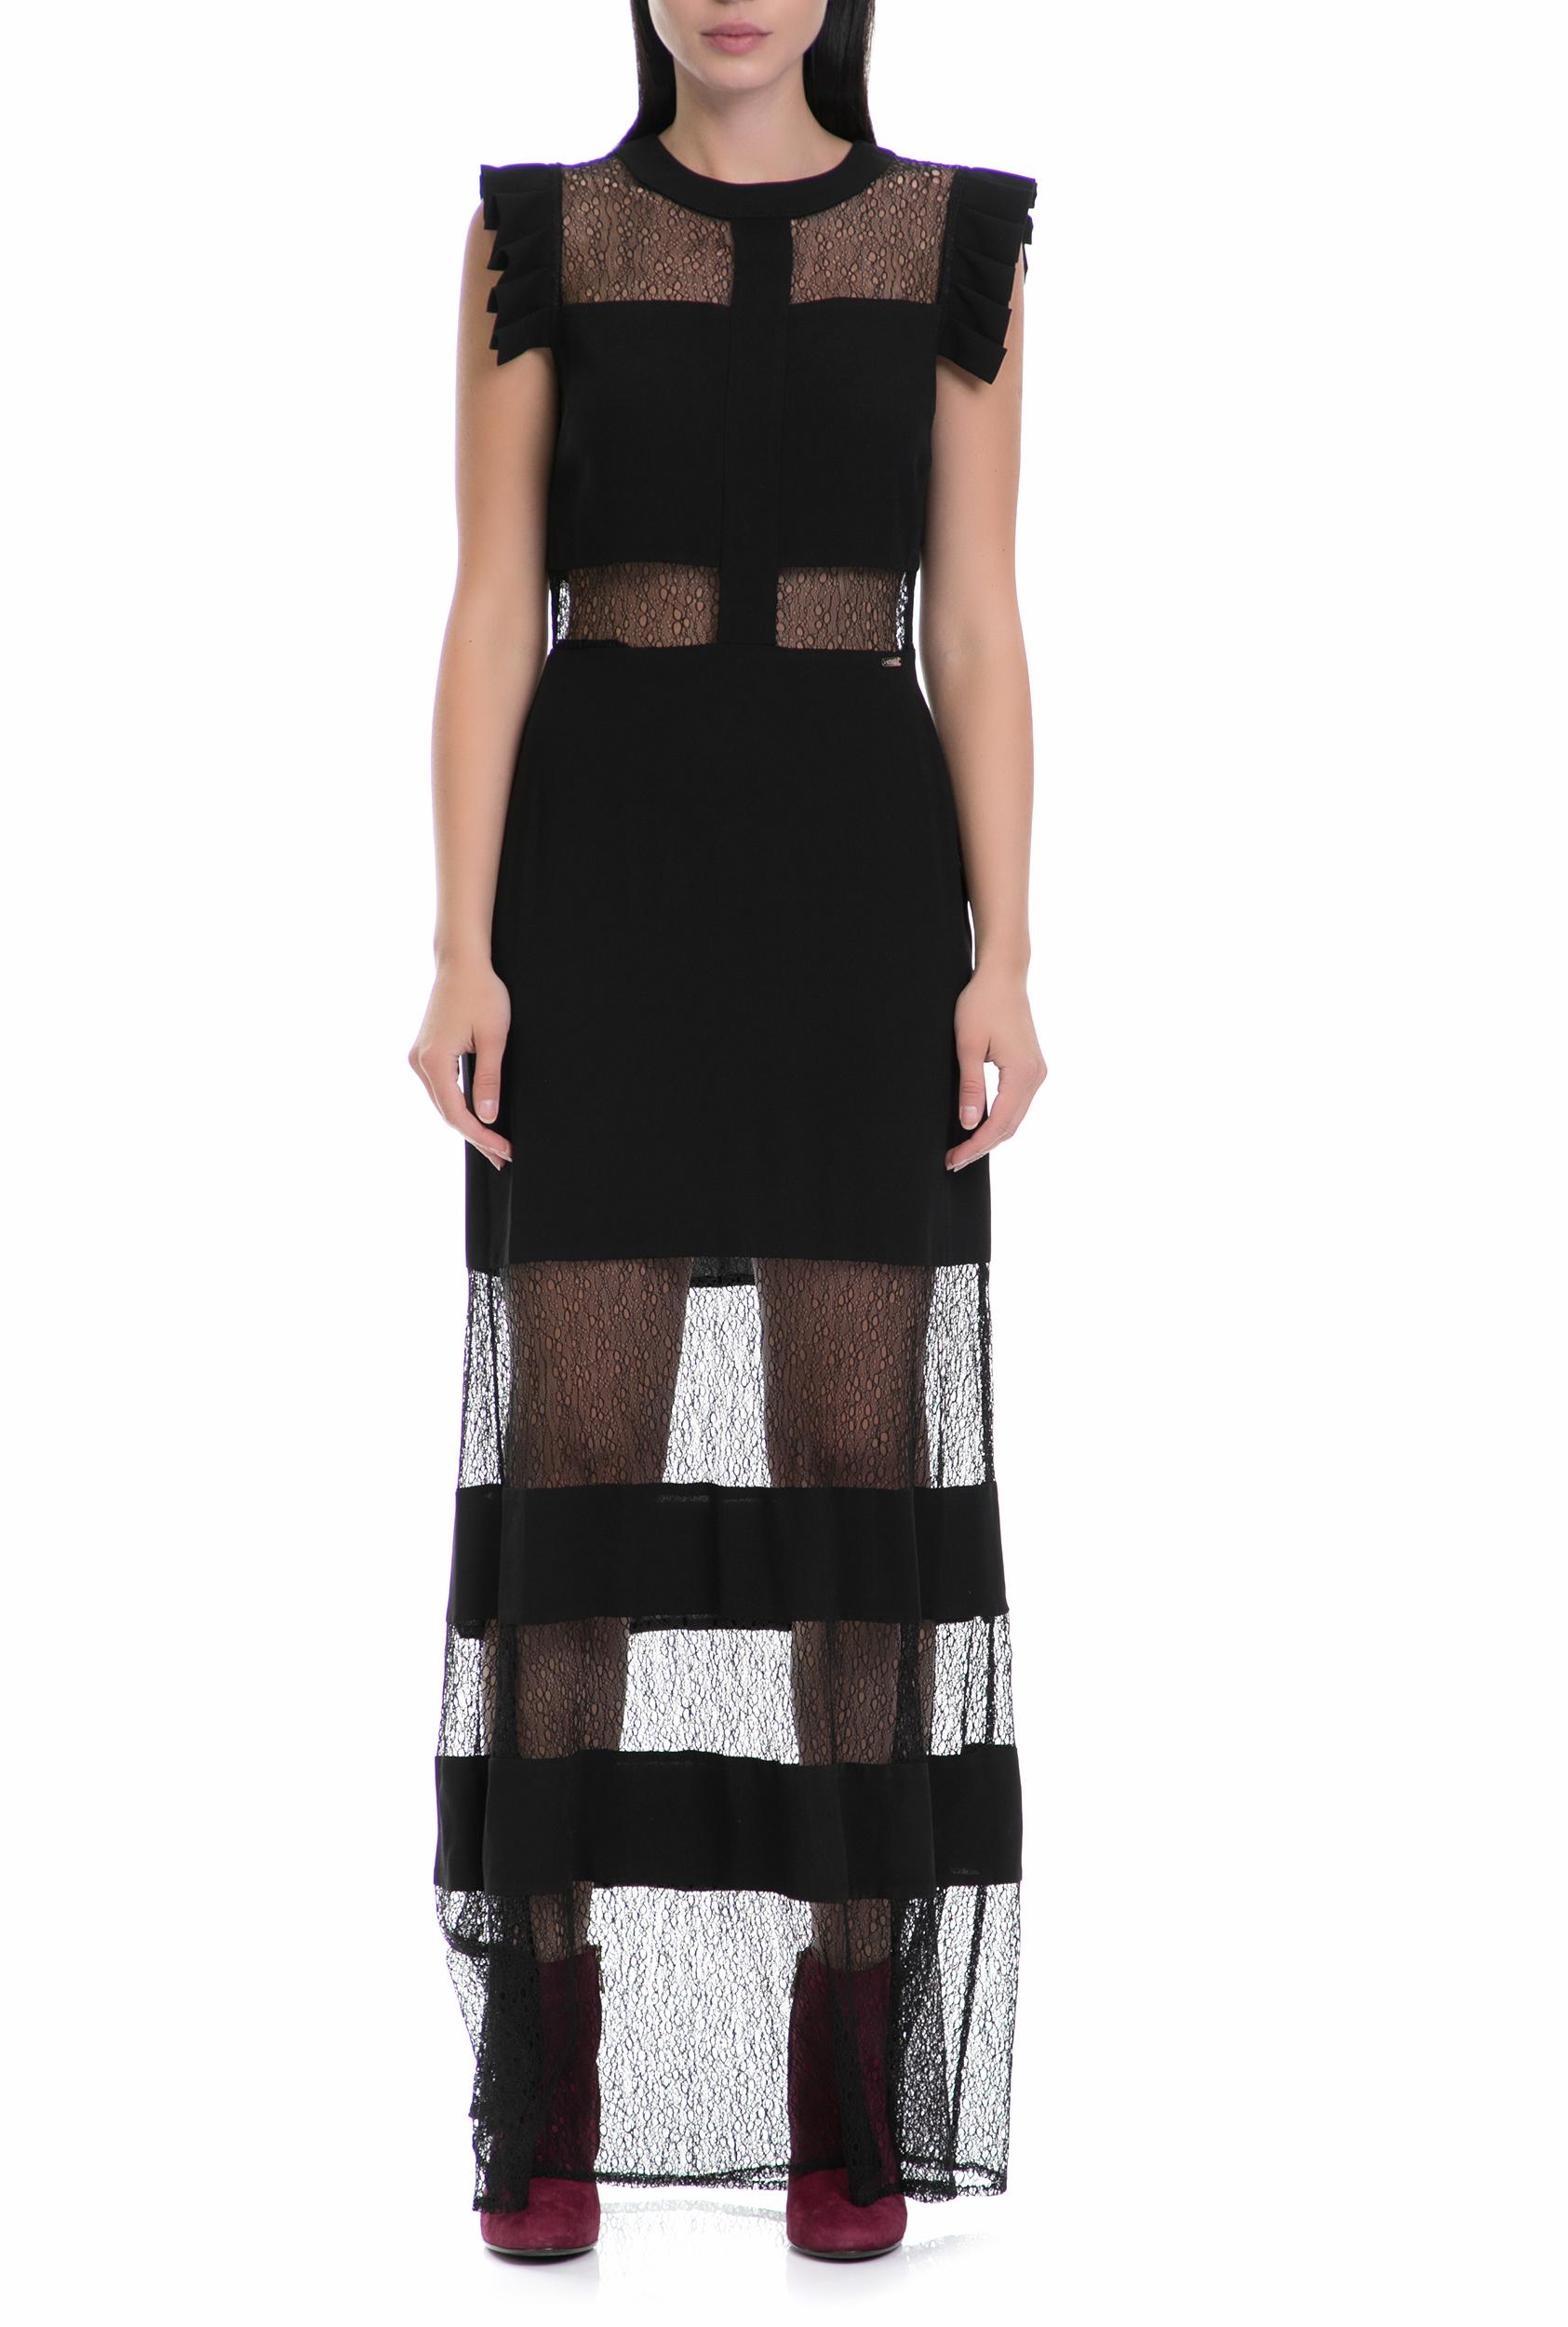 GUESS - Γυναικείο φόρεμα LIZZY GUESS μαύρο 2edff76c9ae